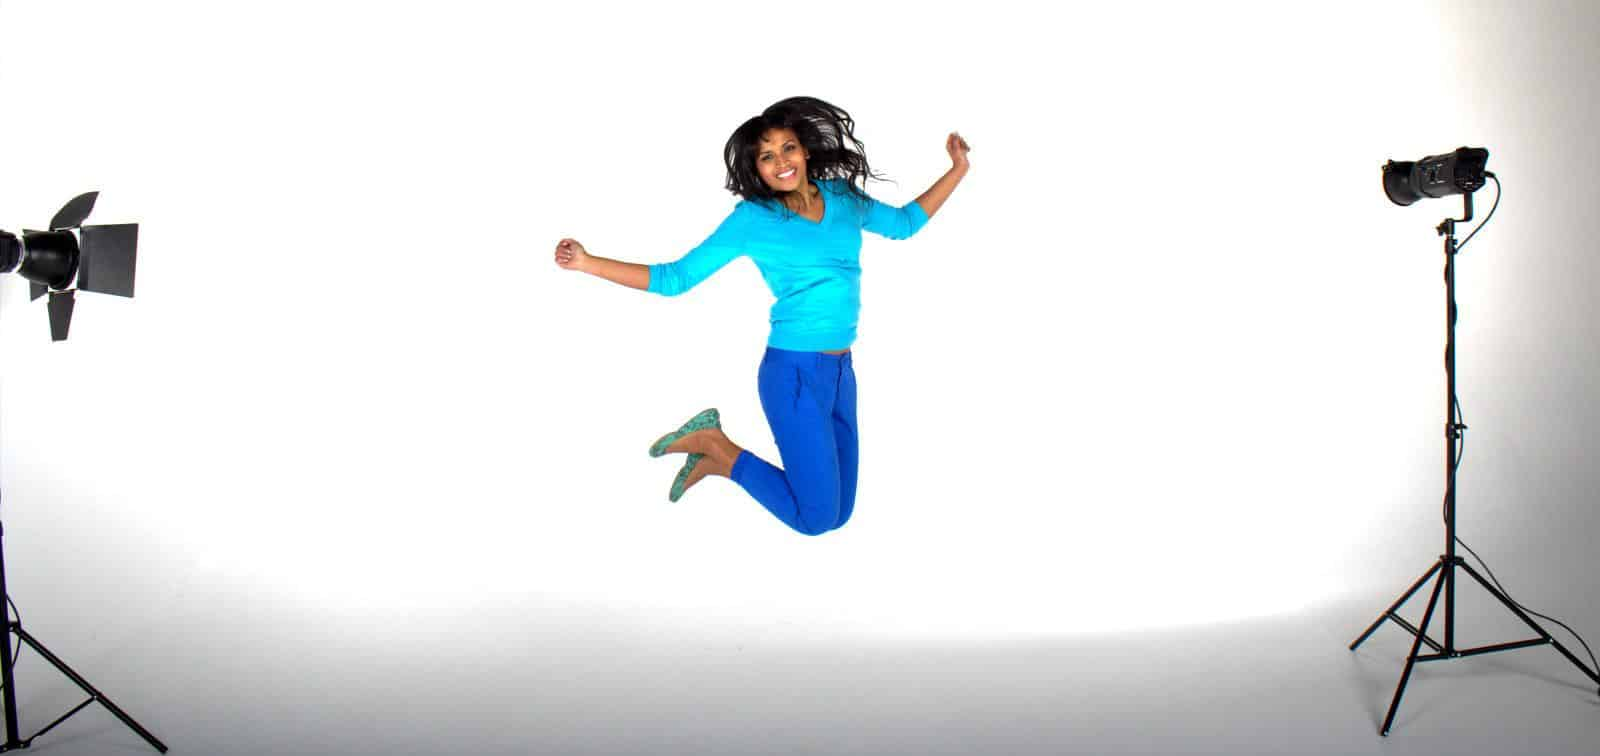 The Lifester Promotional Photoshoot - Ritu Ashrafi